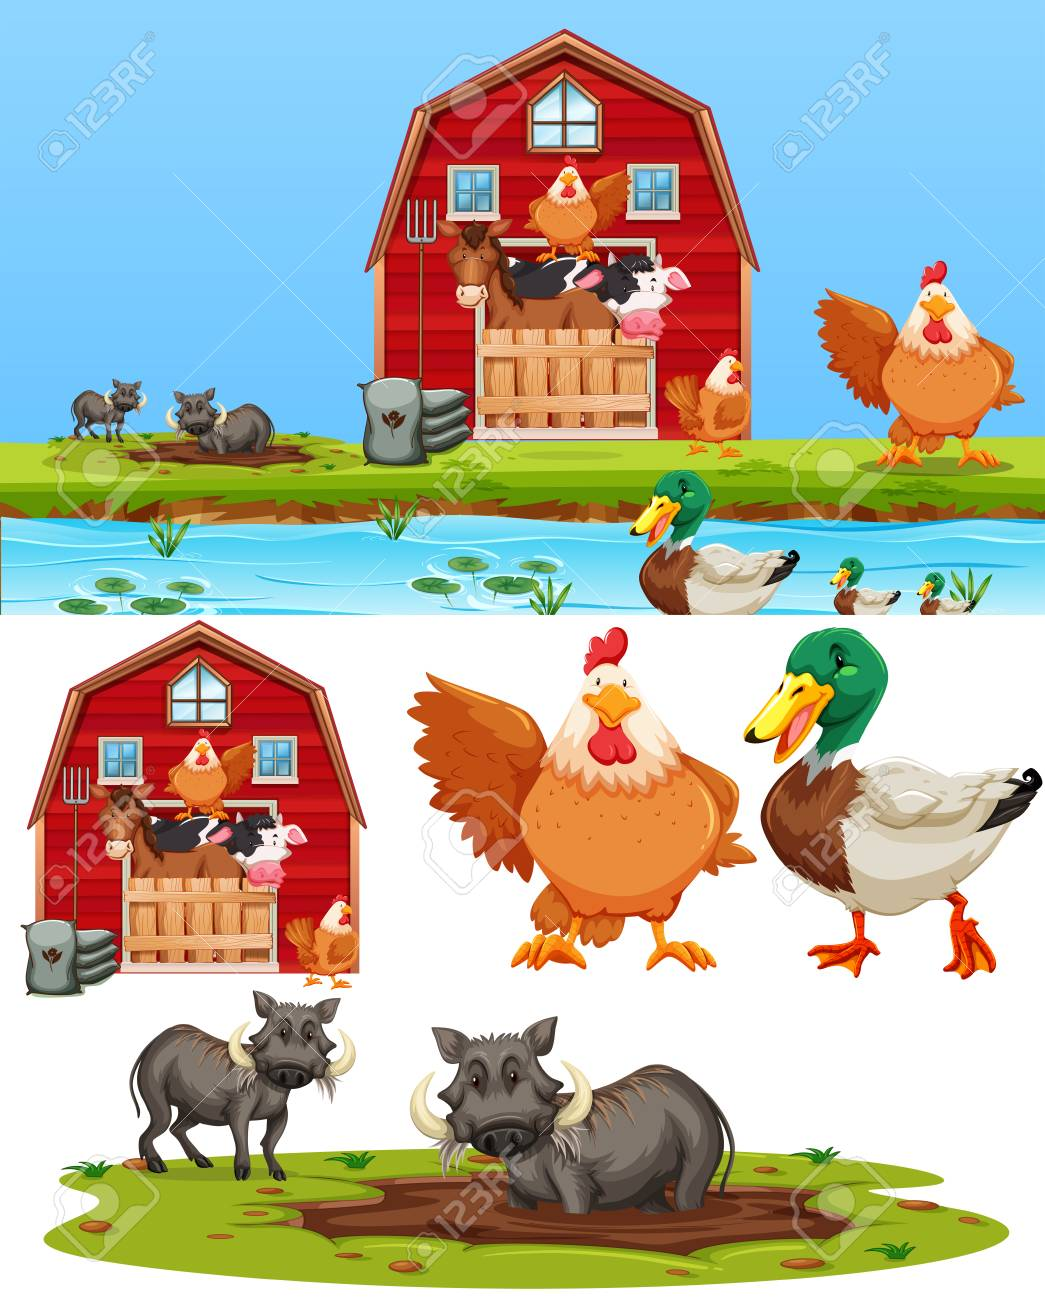 Set of farm element illustration - 125328777